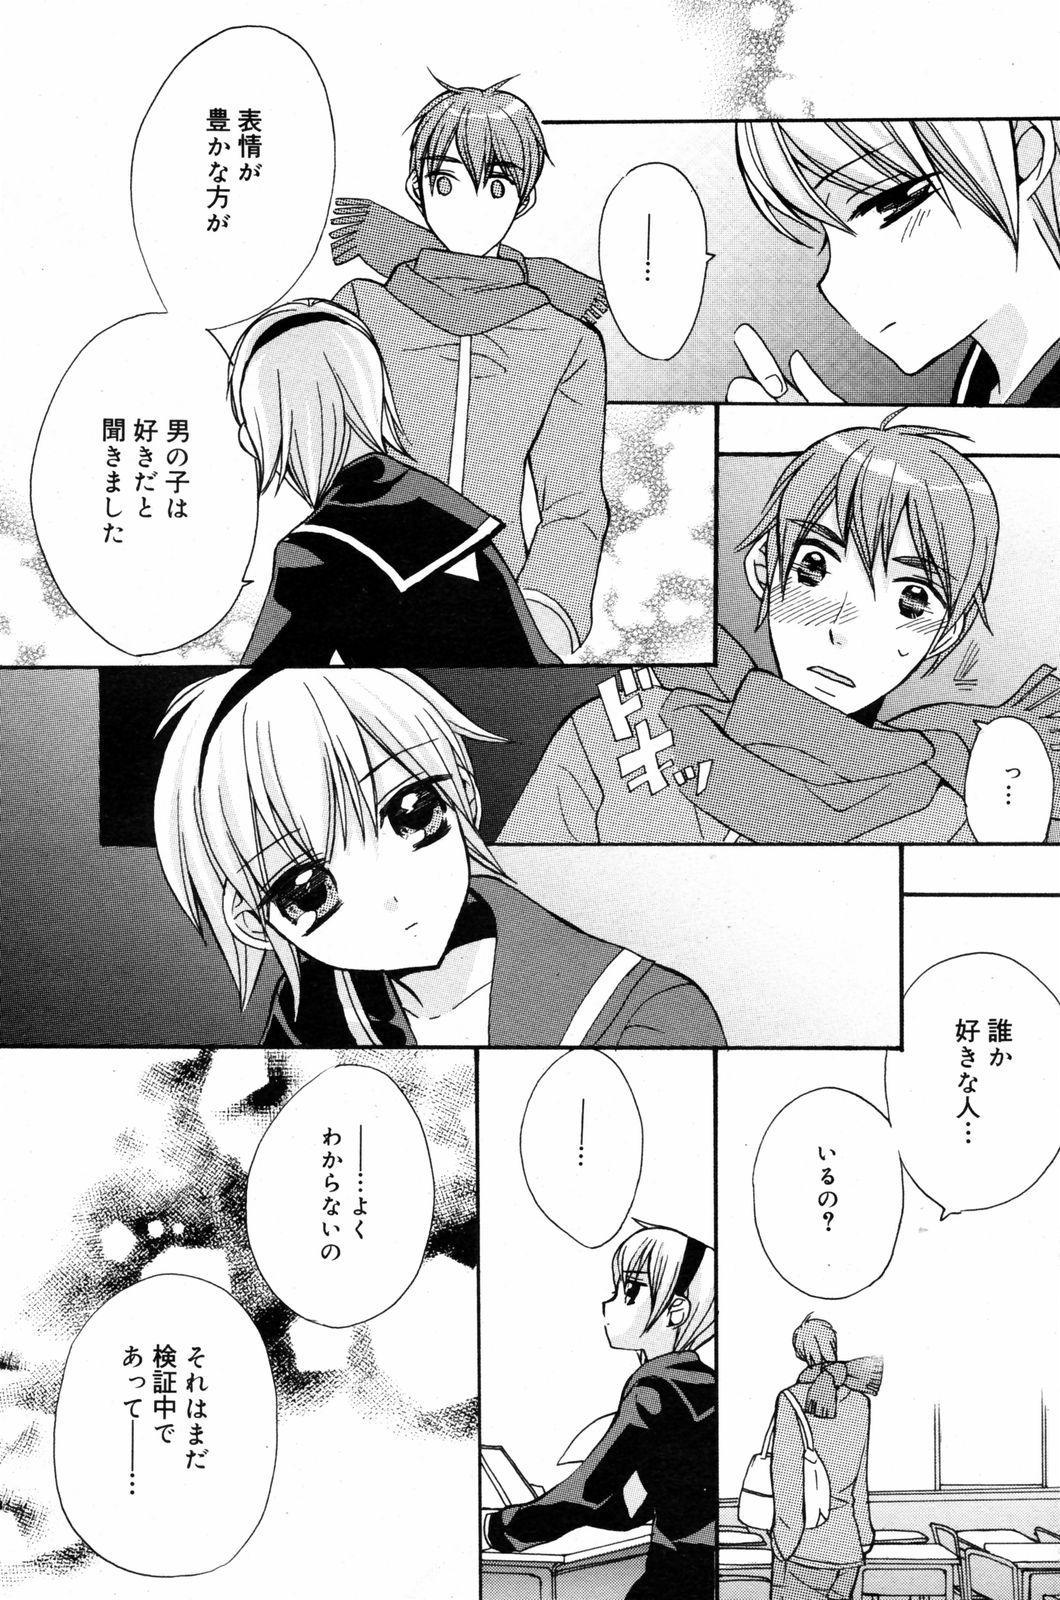 Manga Bangaichi 2008-03 106